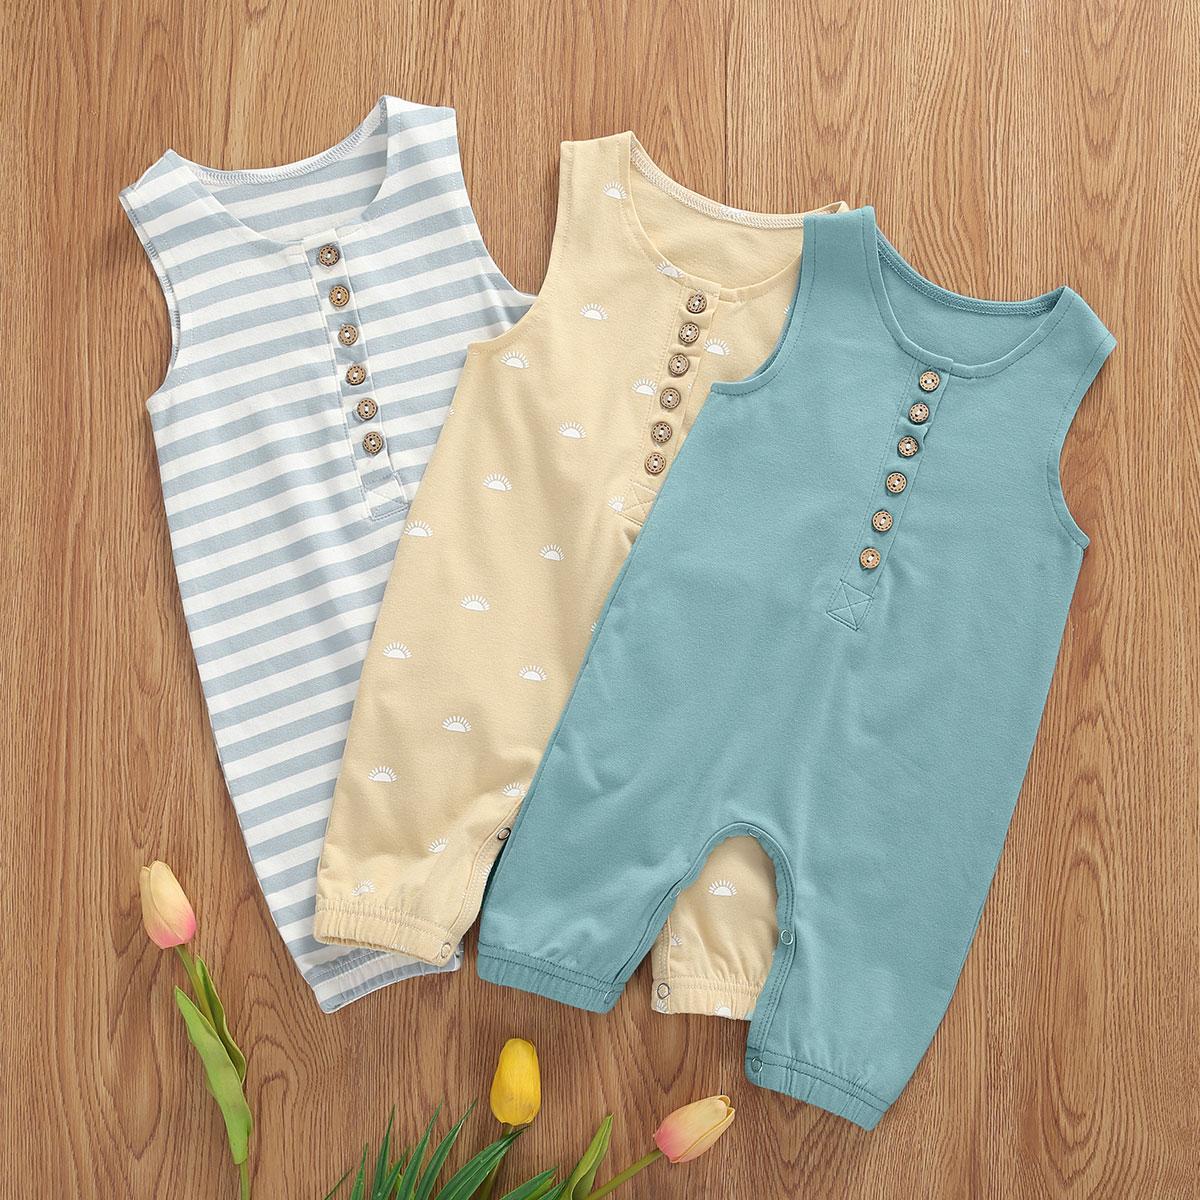 Summer Baby Romper Newborn Boys Girls Clothes Infant Soft 1 Piece Sleeveless Jumpsuit Cotton Clothing